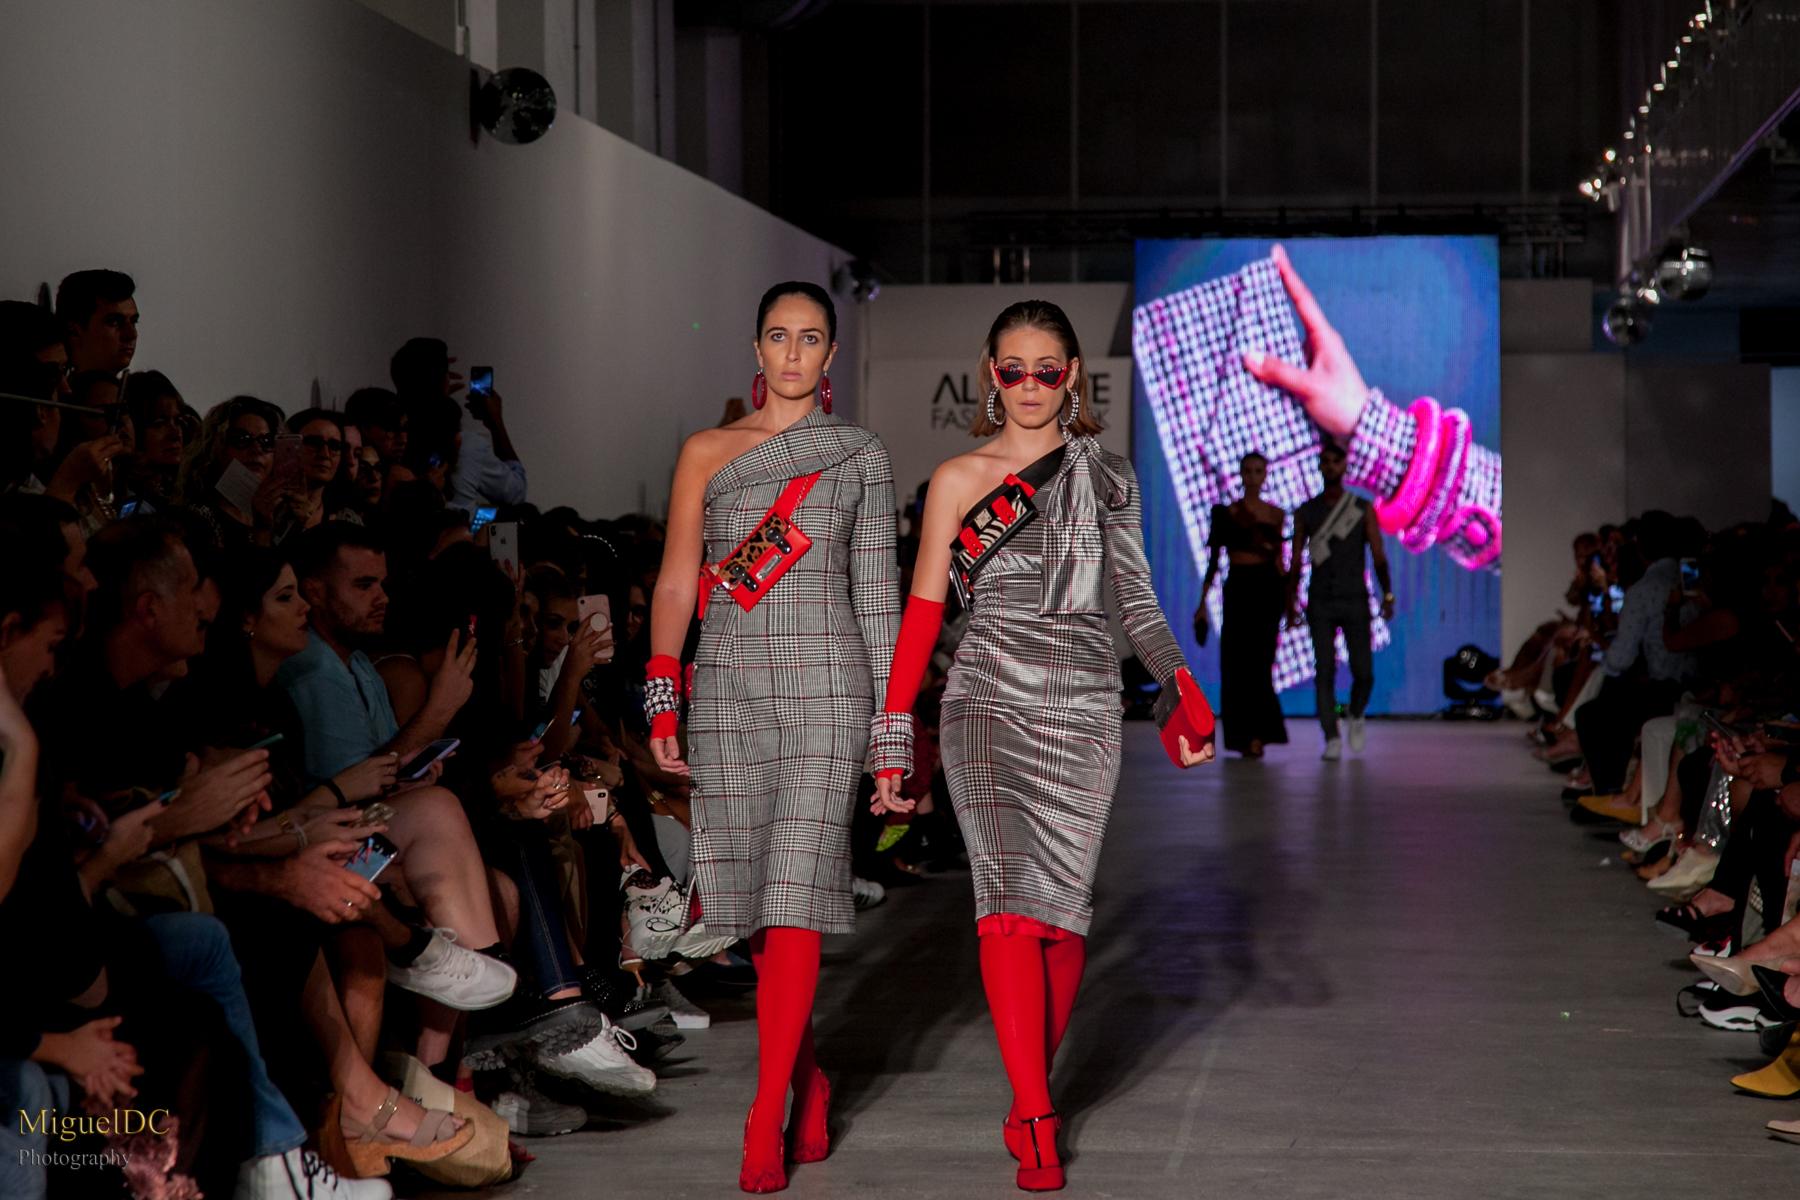 Desfile fashion week Alicante